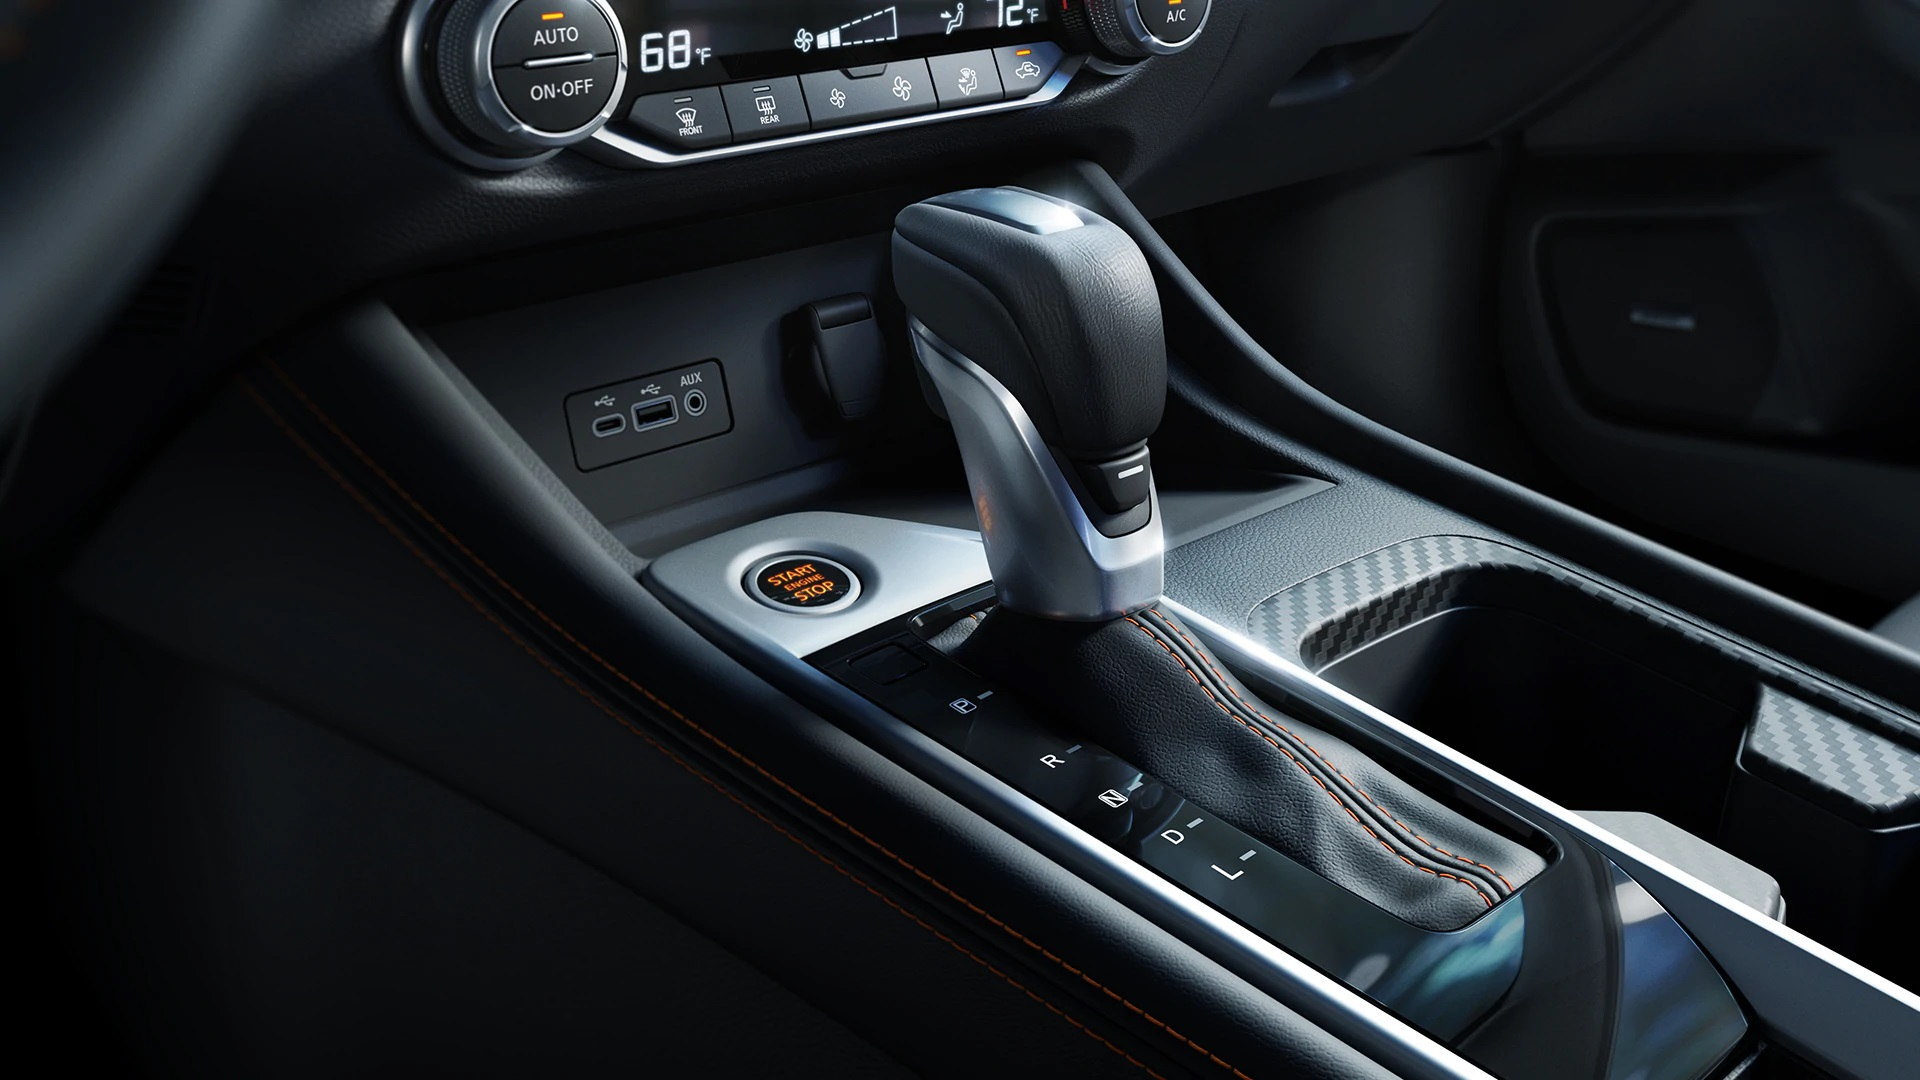 2020 Nissan Sentra Center Console